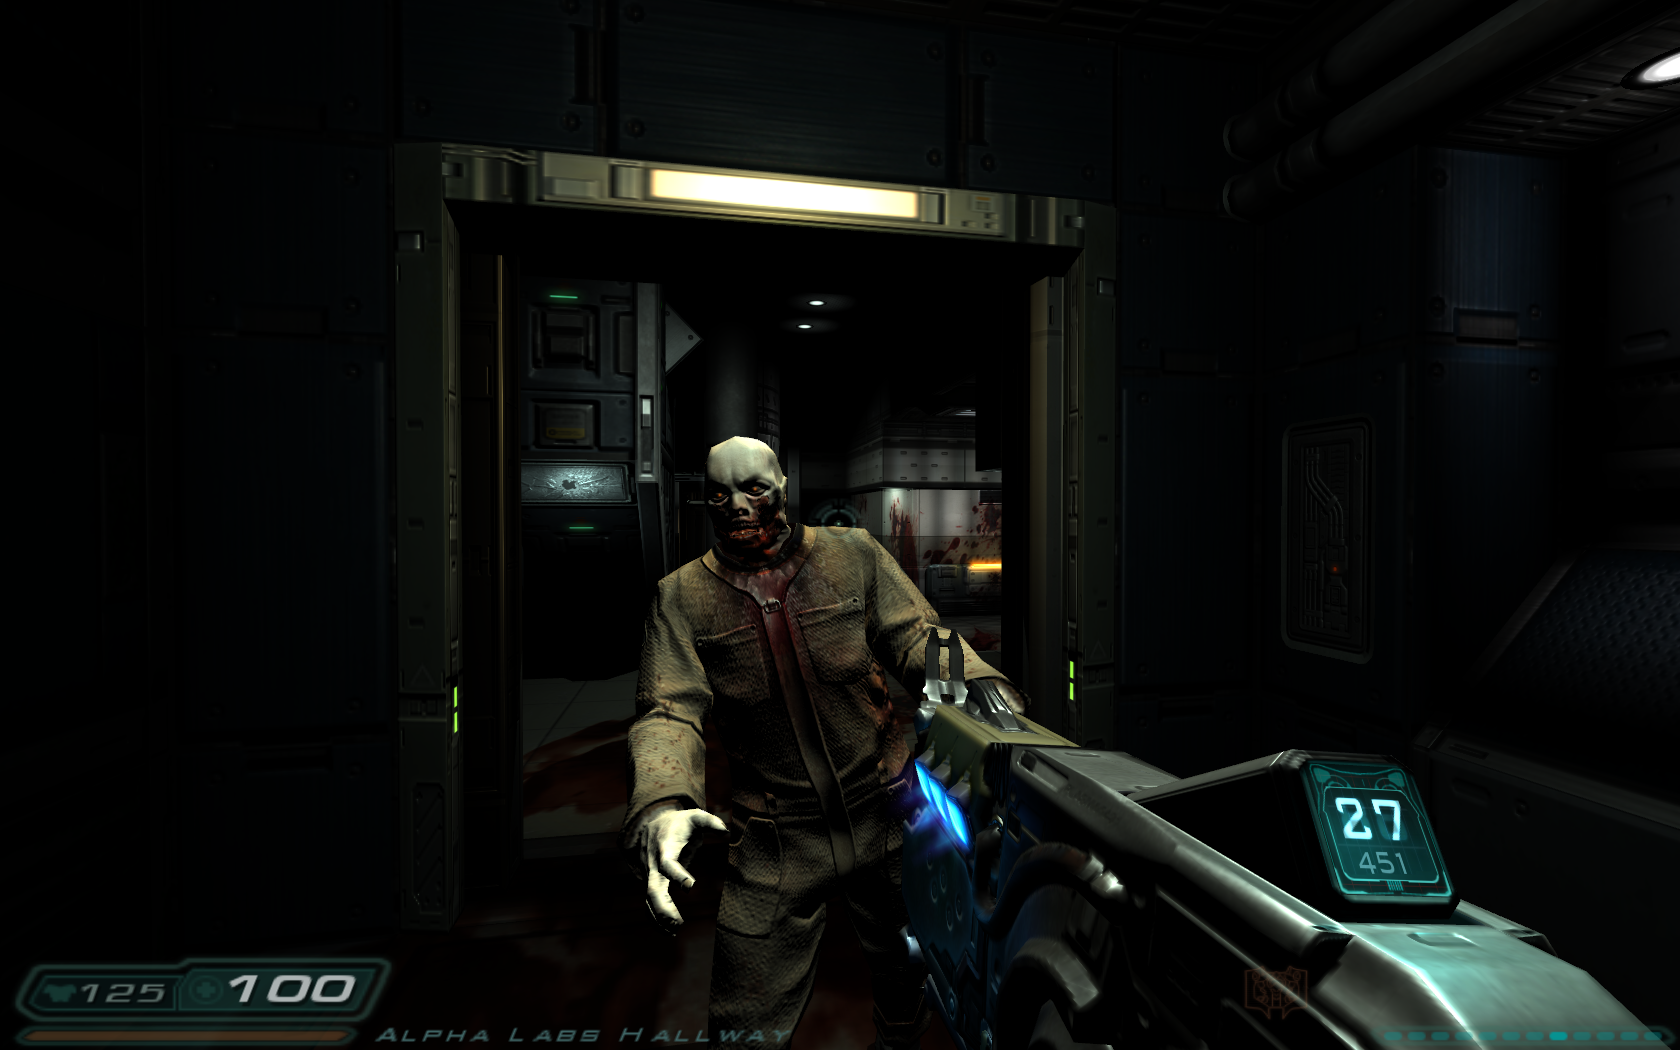 49+] Doom 3 Wallpaper Free Download on WallpaperSafari